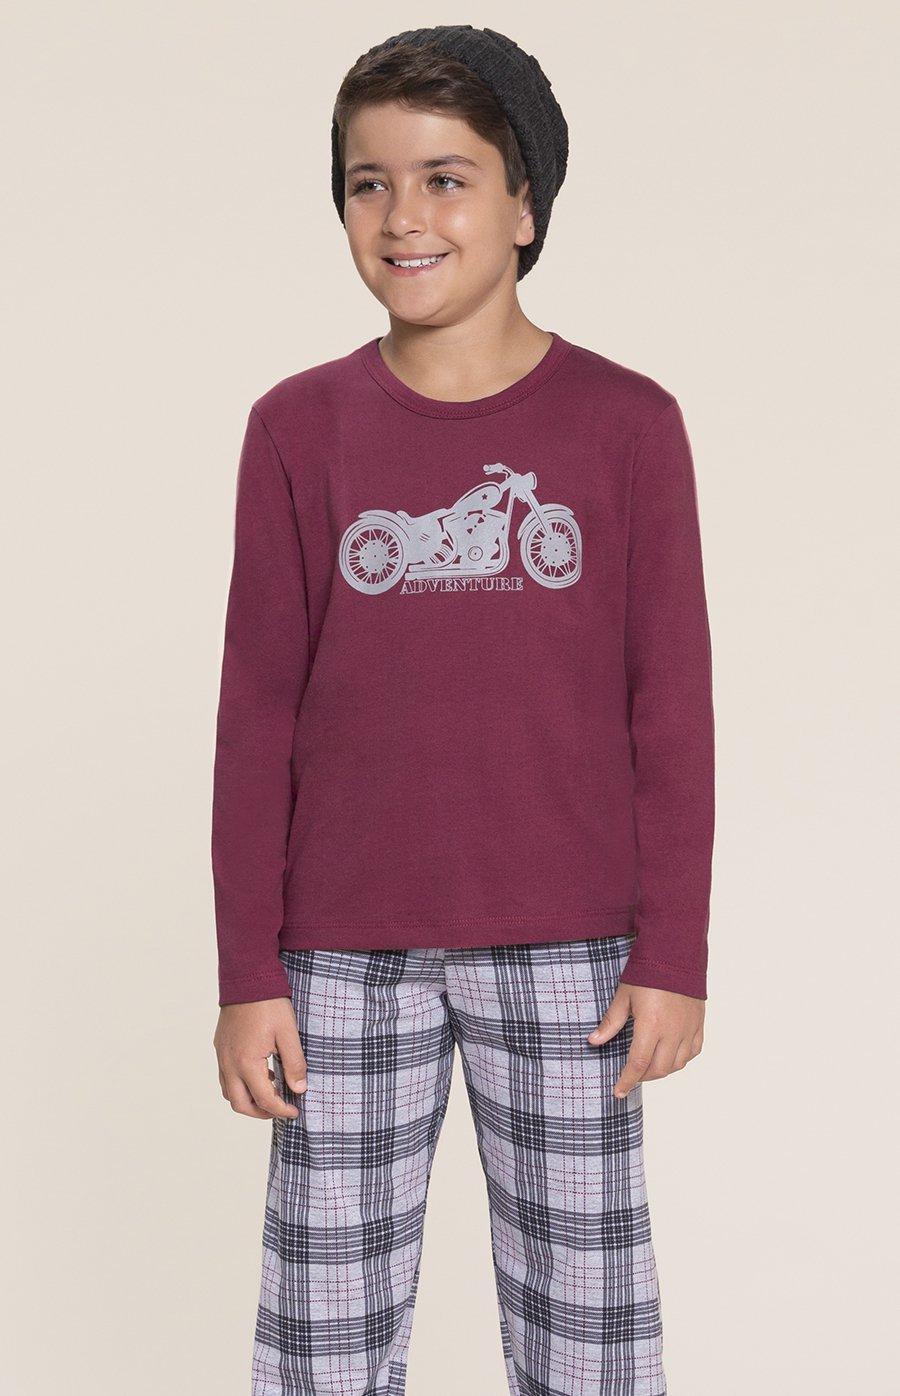 Pijama Infantil 1/2 Malha Aventura Inverno 2020 SWEET STORIES